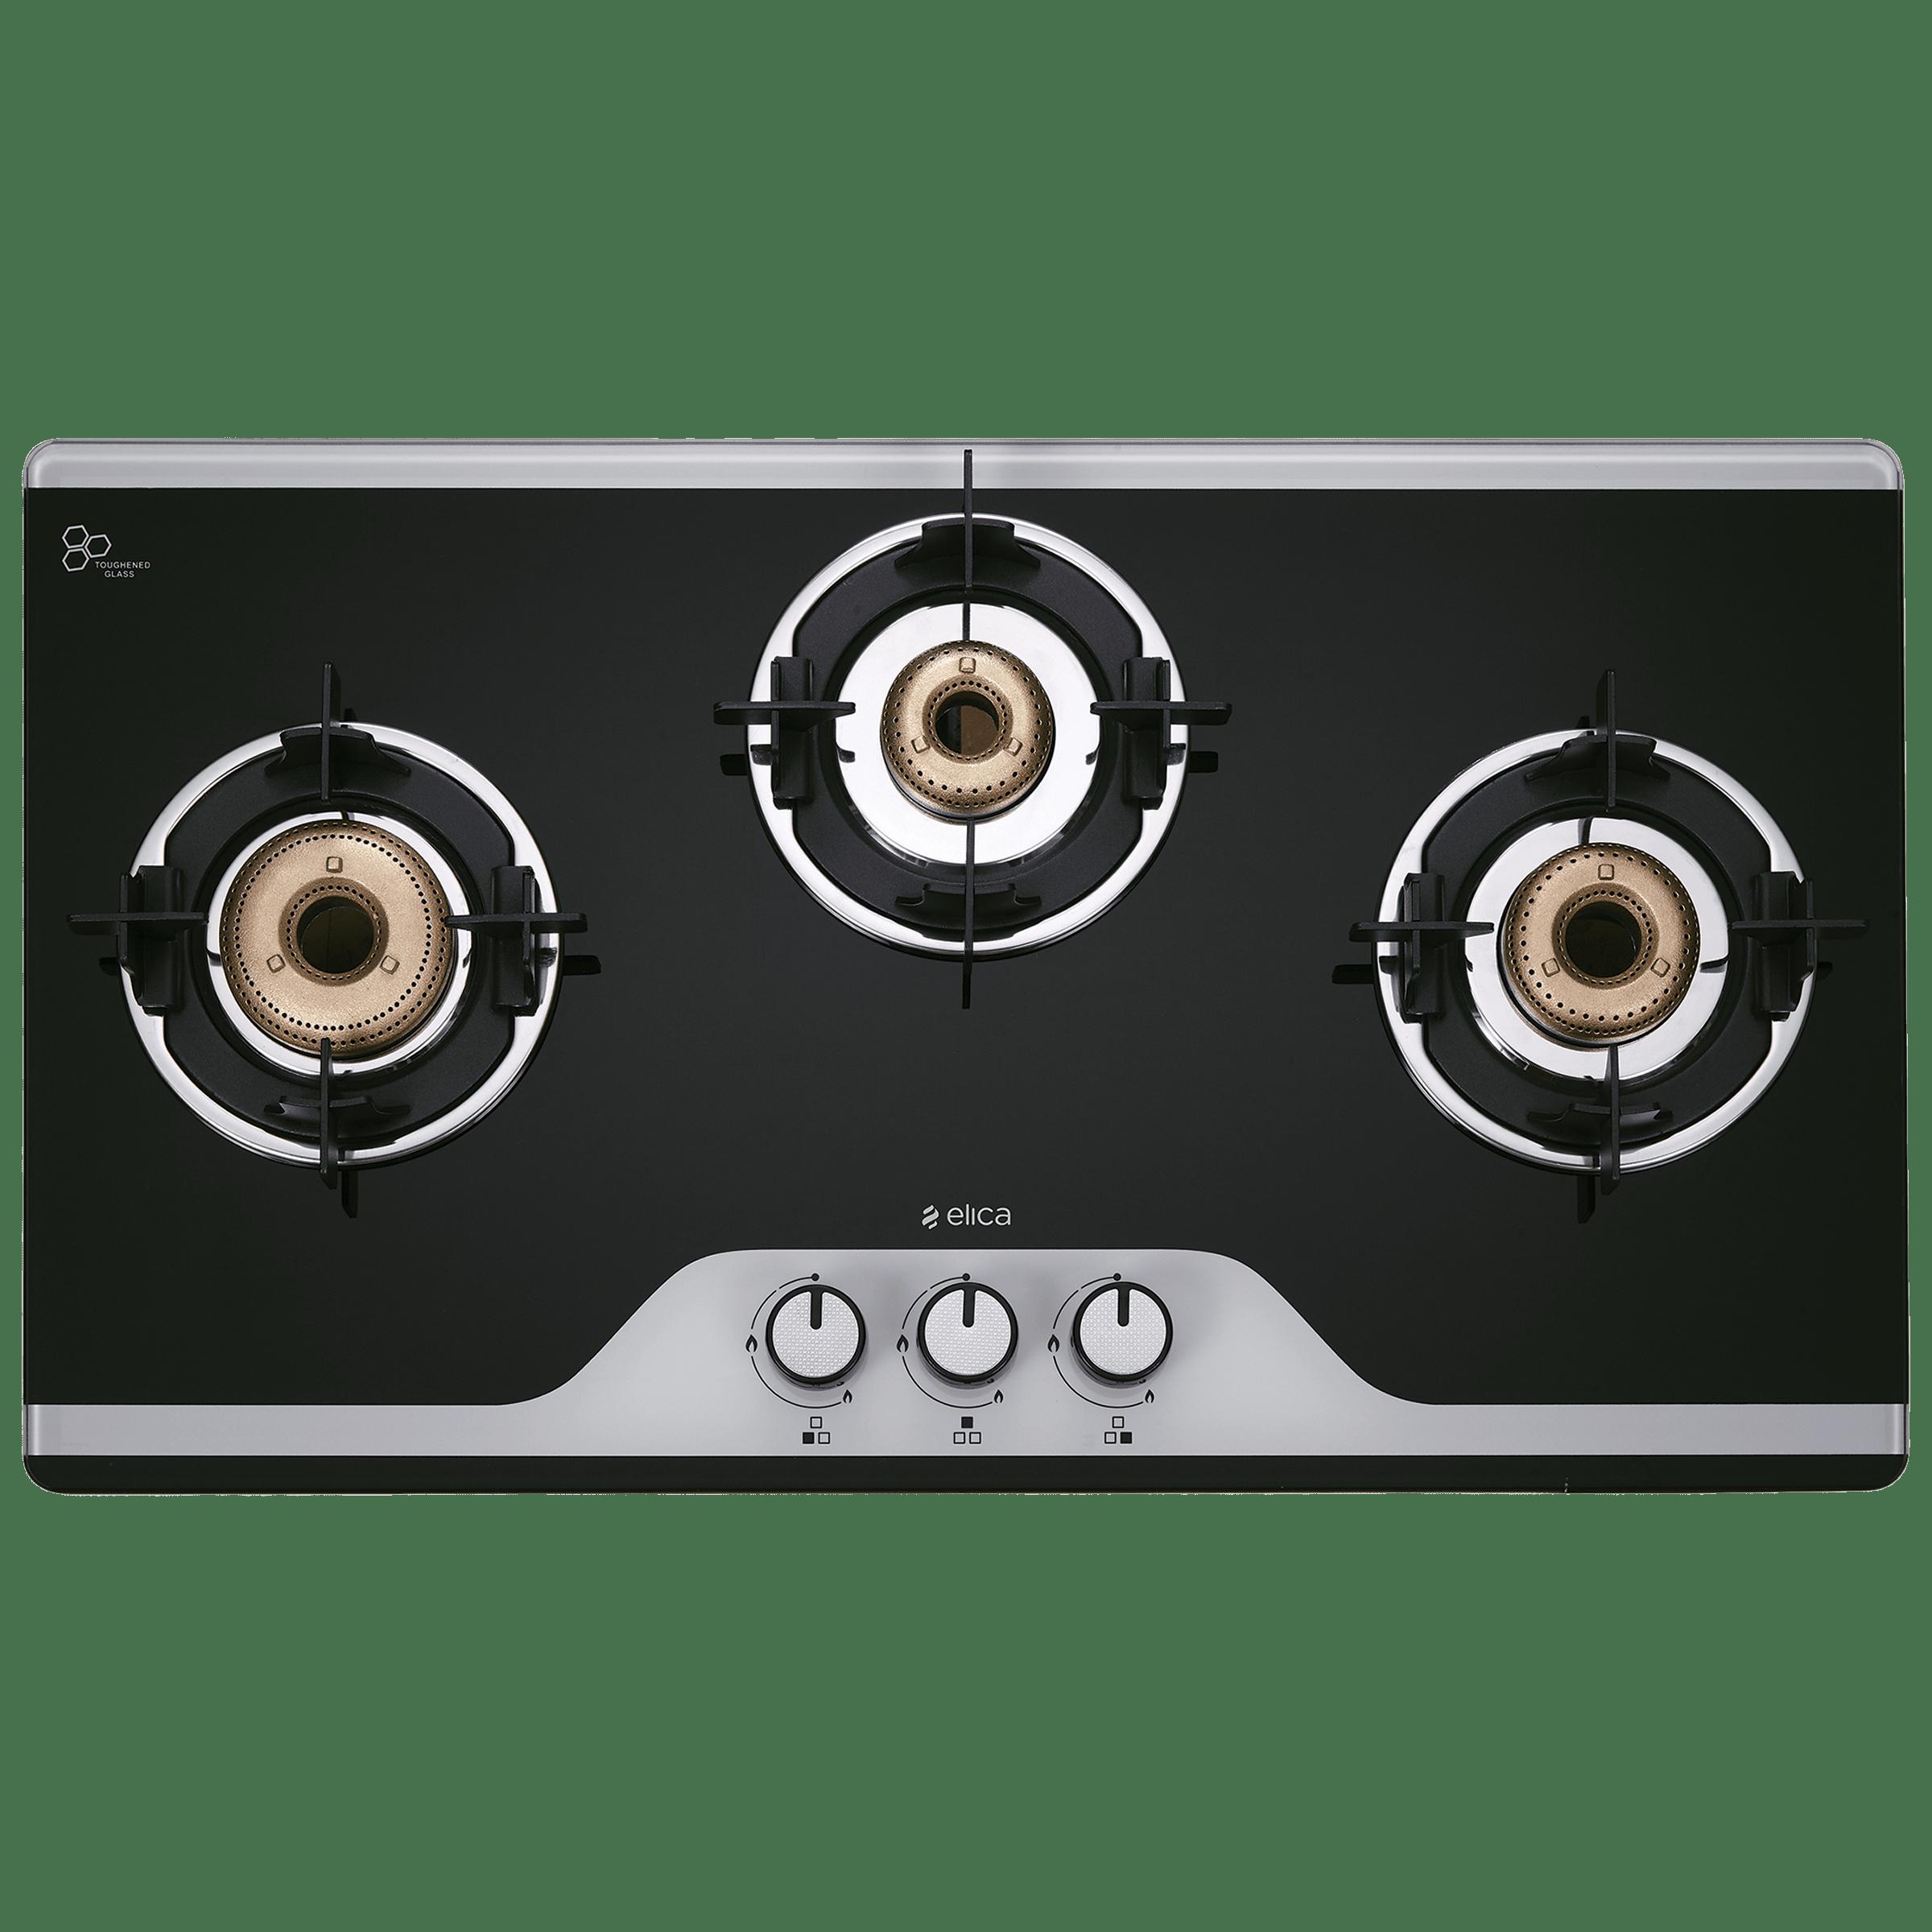 Elica TKN Crown DT AI 3 Burner Dual Tone Toughened Glass Gas Stove (Bakelite Knobs, 773 CT Vetro, Black)